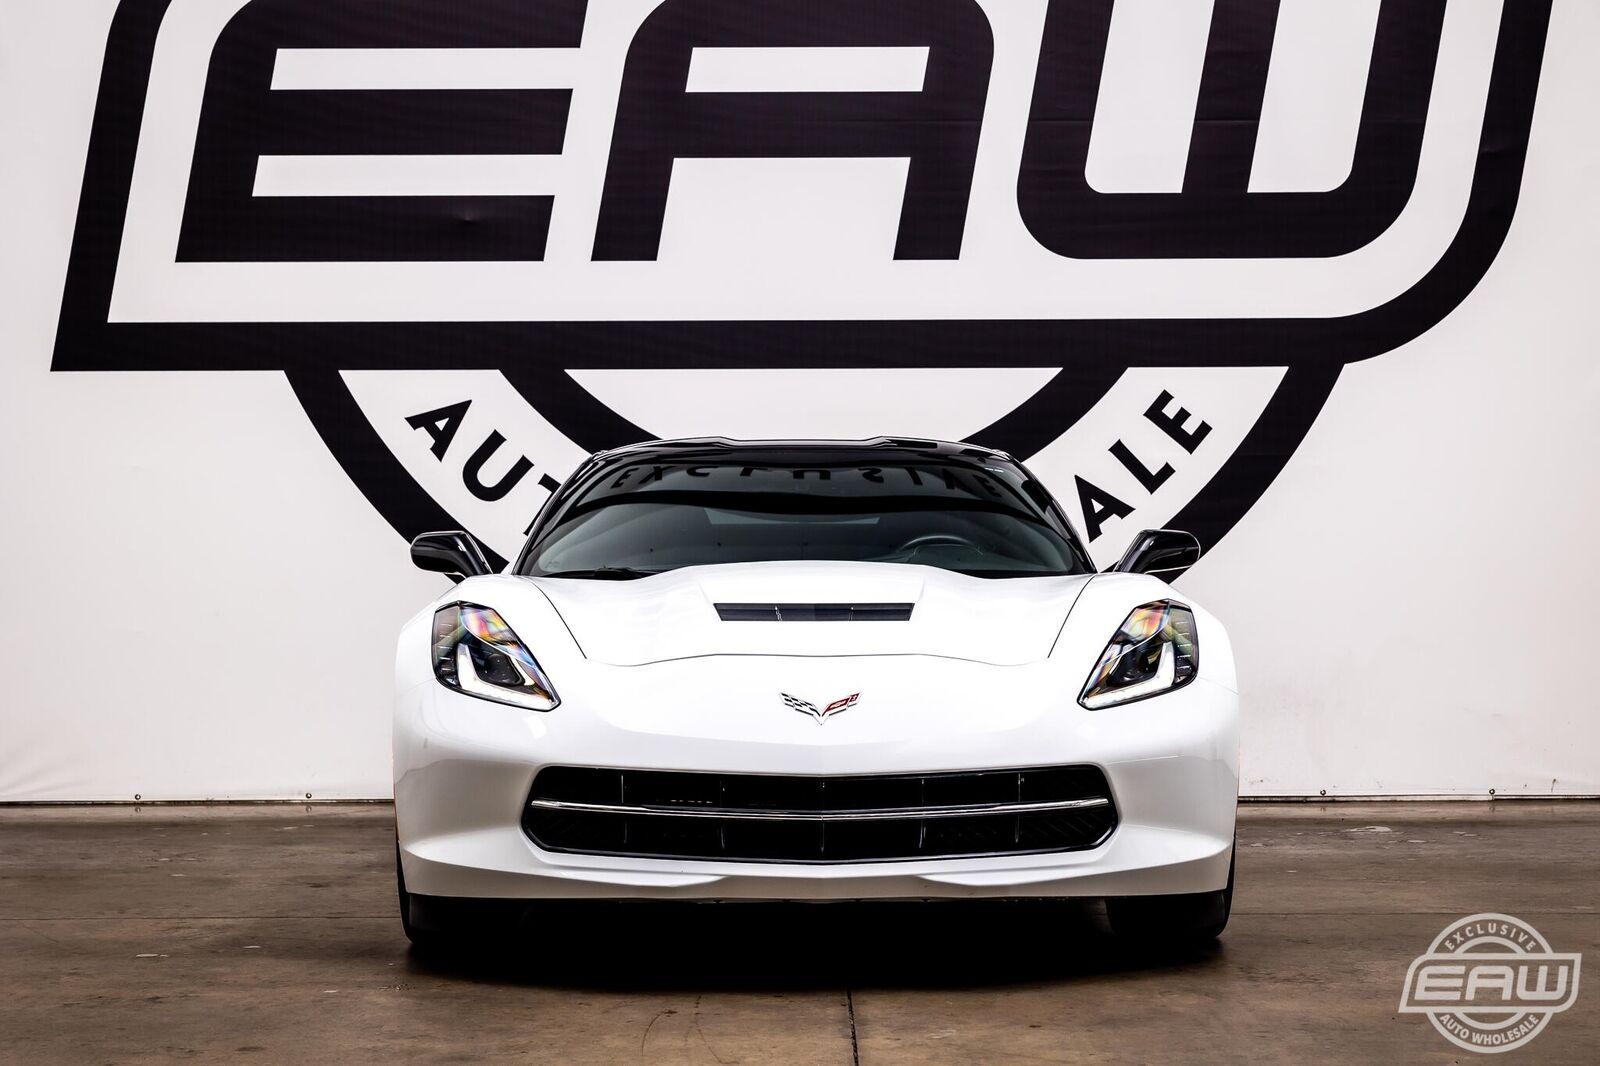 2014 White Chevrolet Corvette Coupe 1LT   C7 Corvette Photo 3